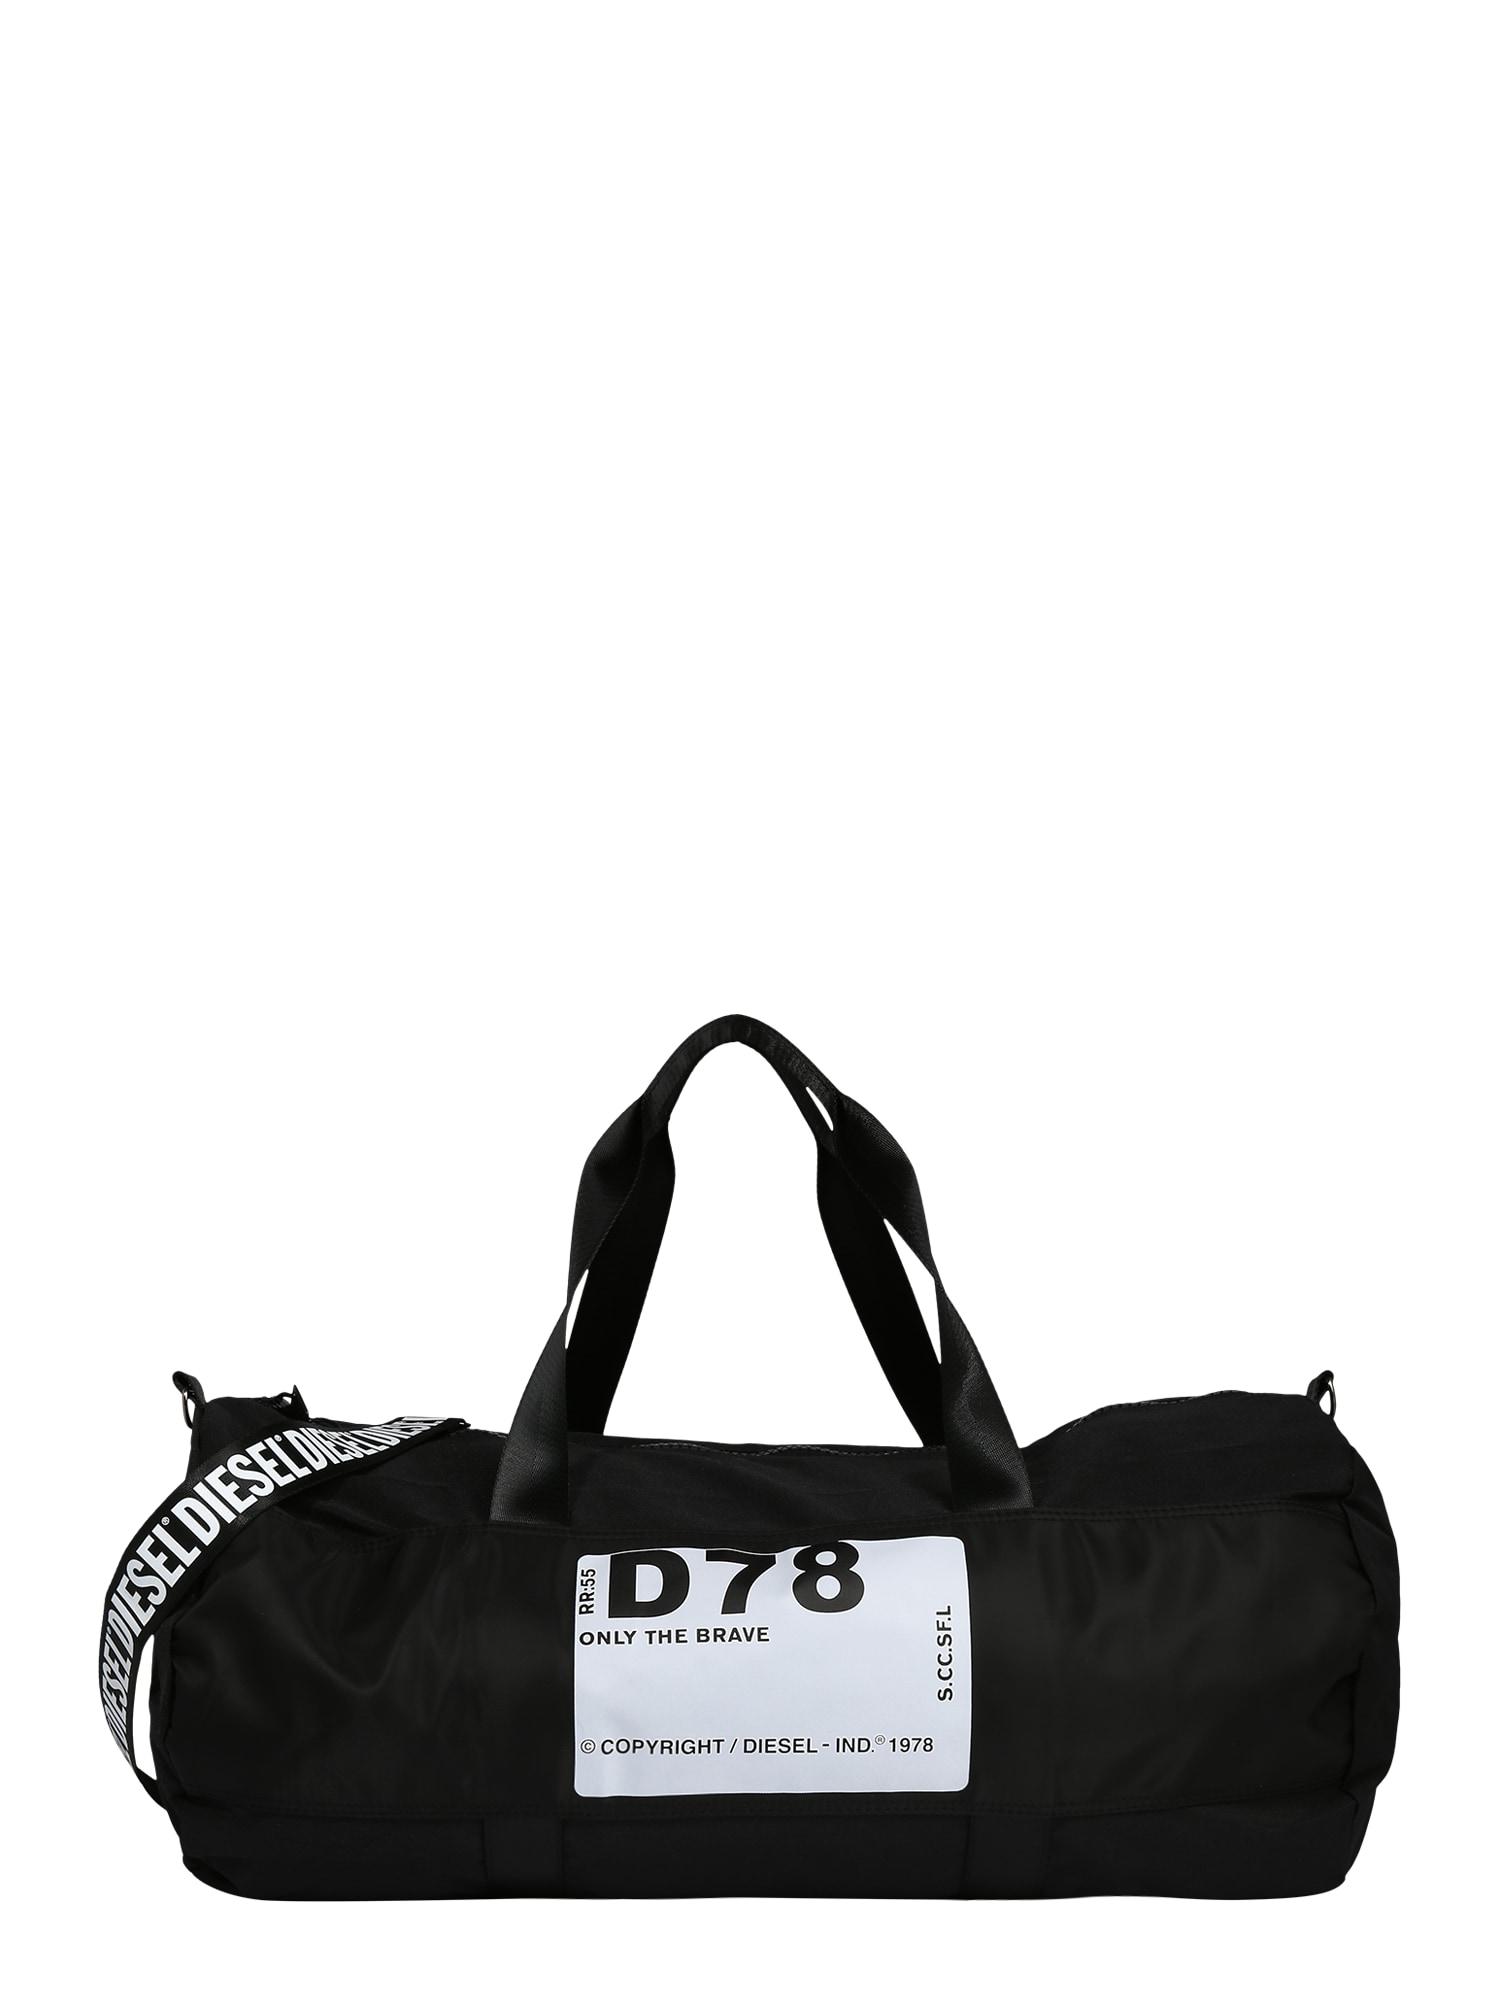 DIESEL Kelioninis krepšys juoda / balta